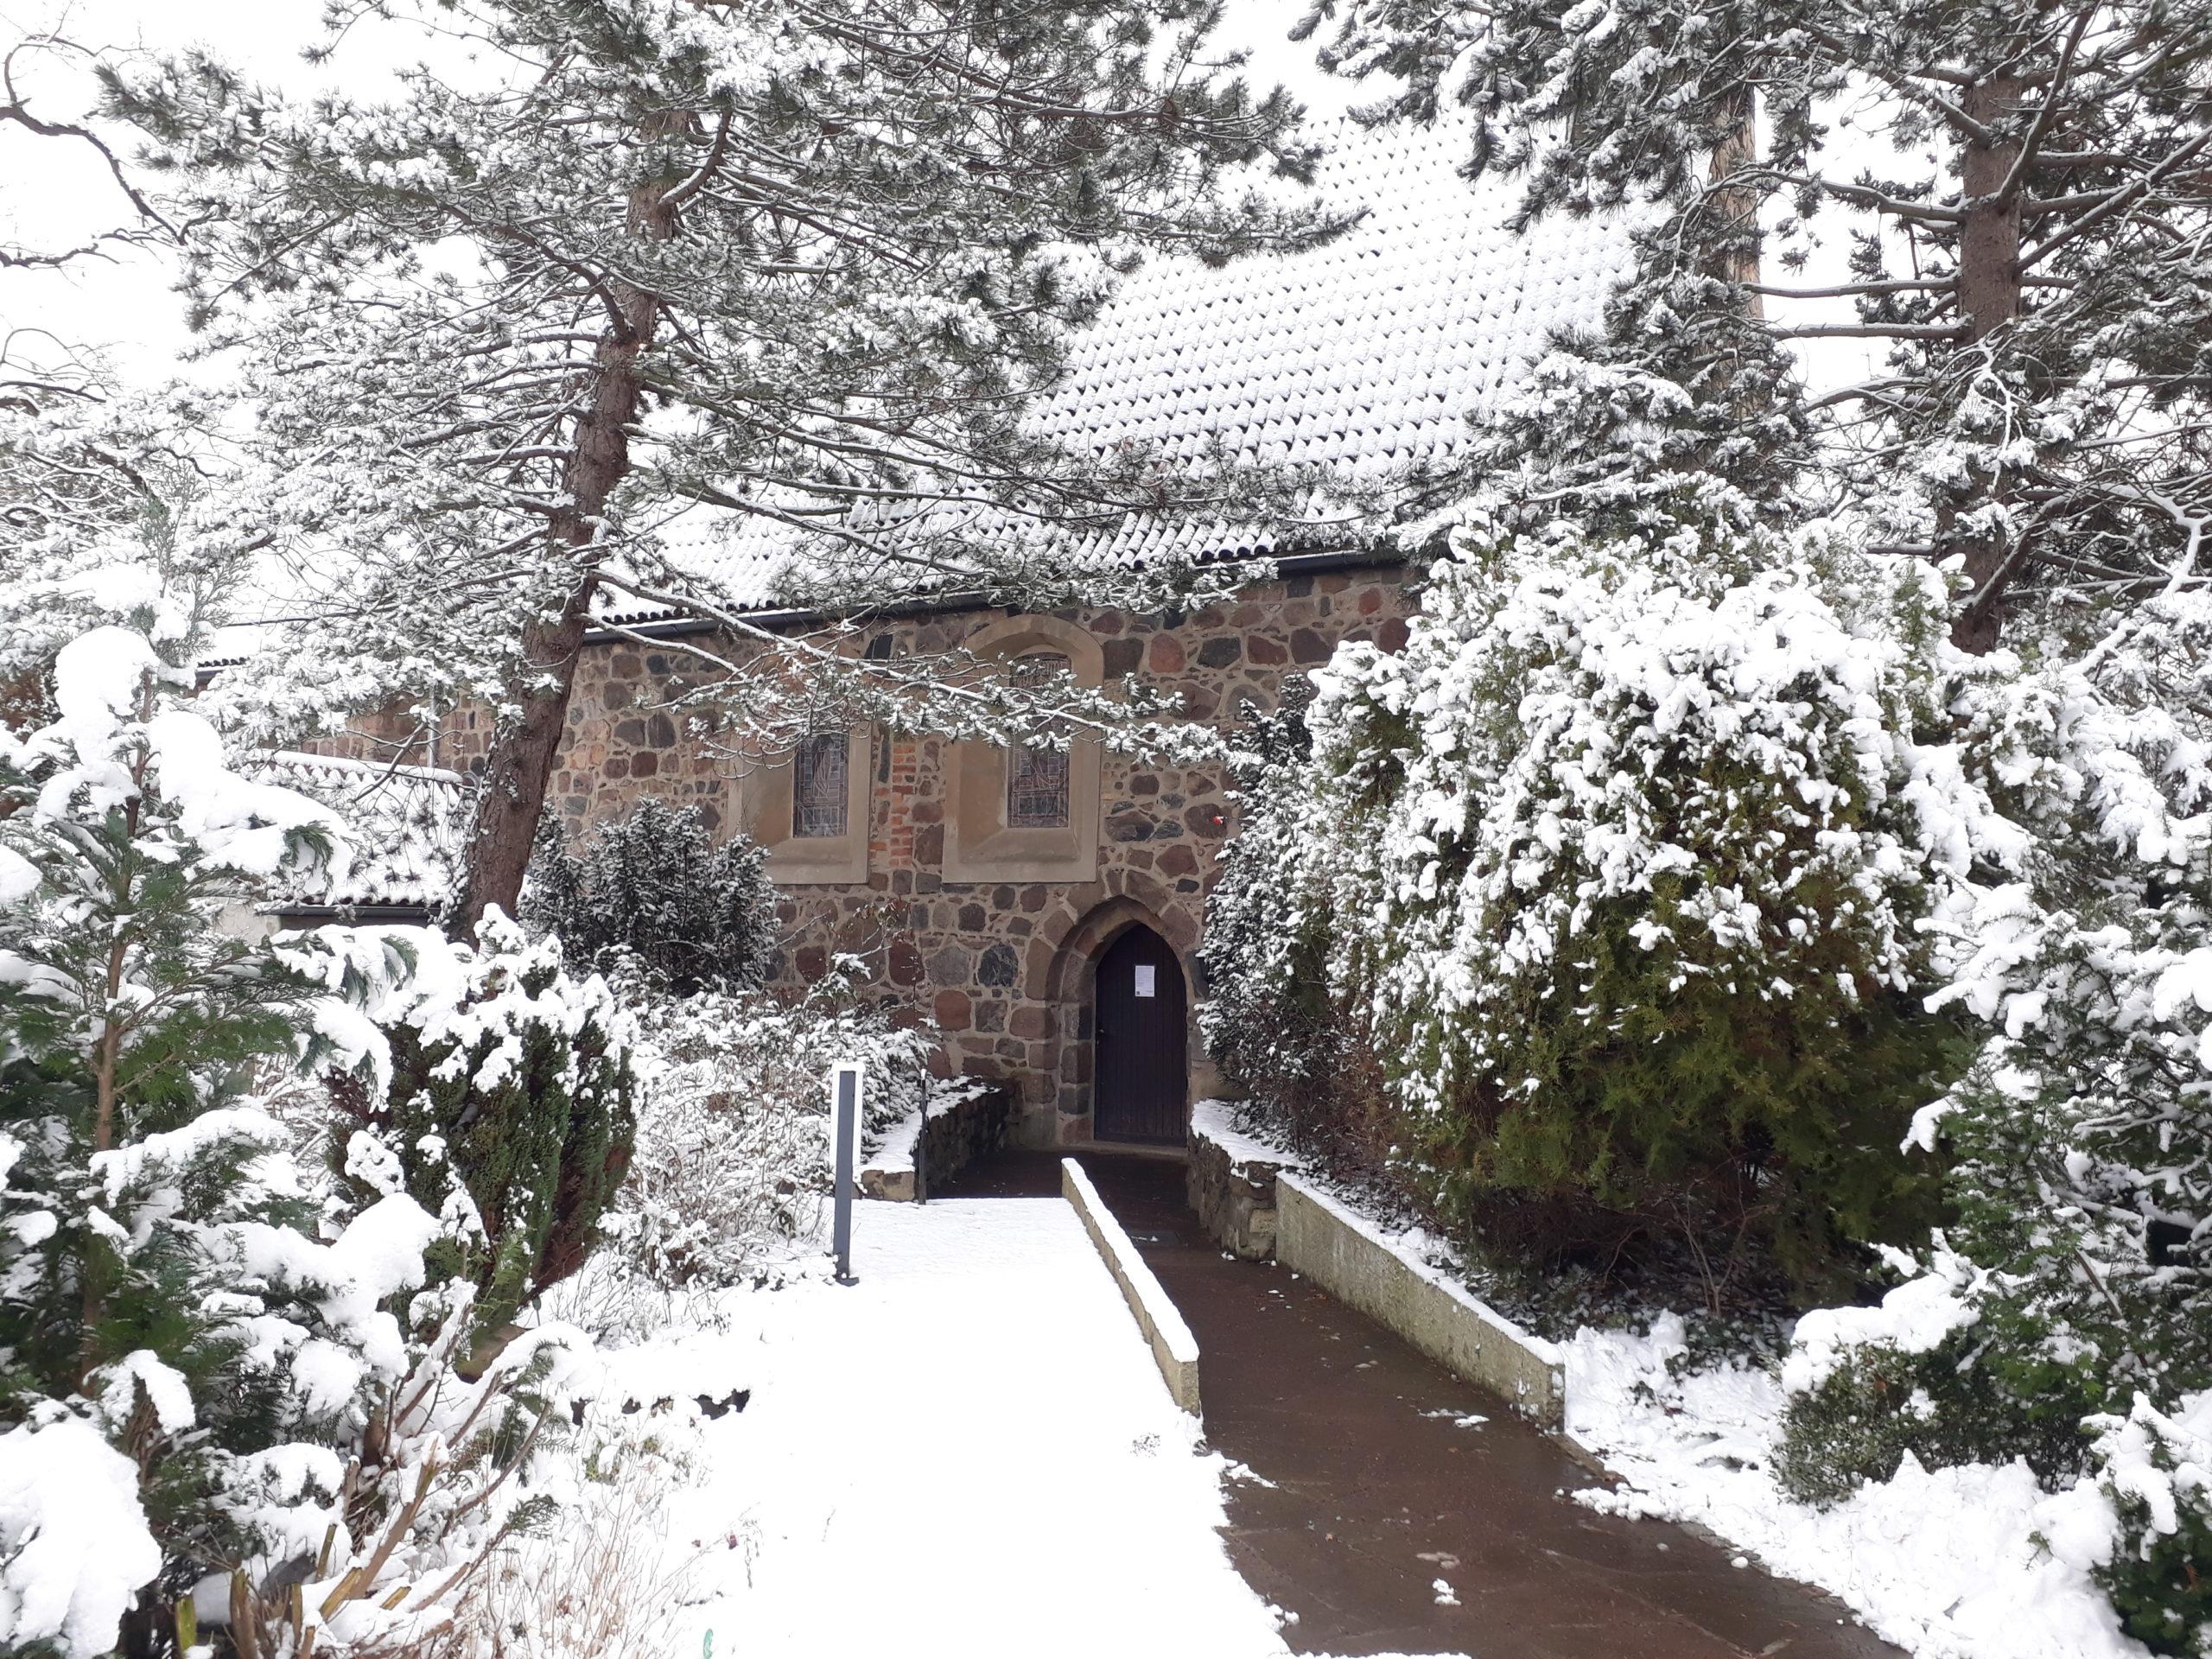 Leila Schoeneich Dorfkirche Giesensdorf